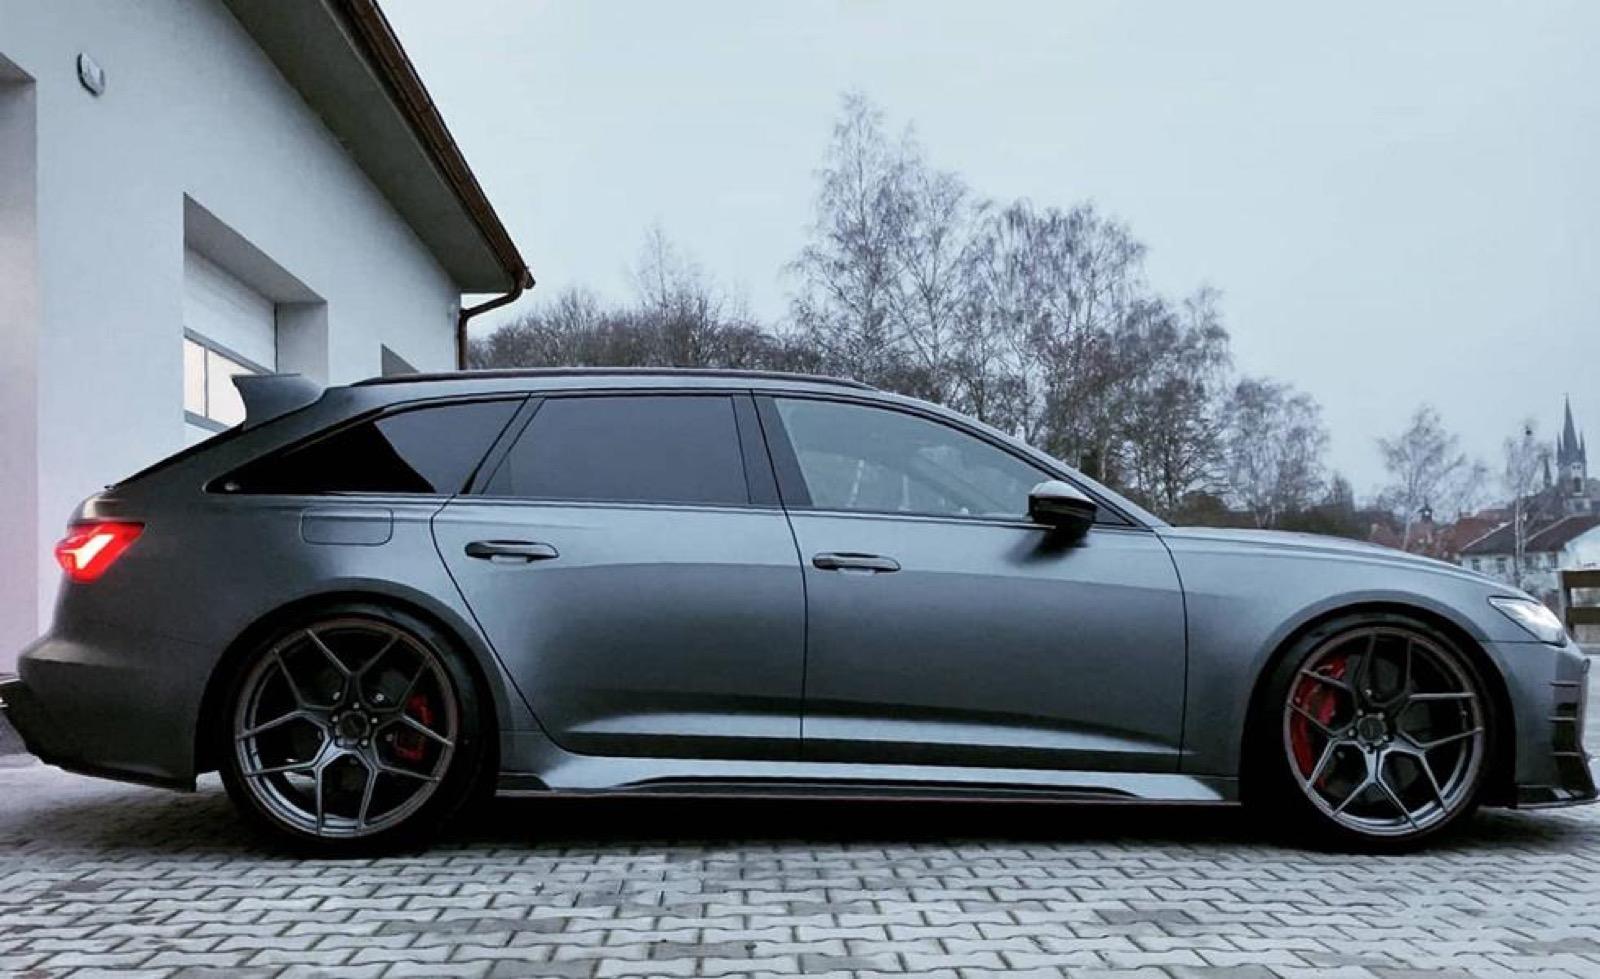 Audi-RS6-Avant-by-Keyvany-3